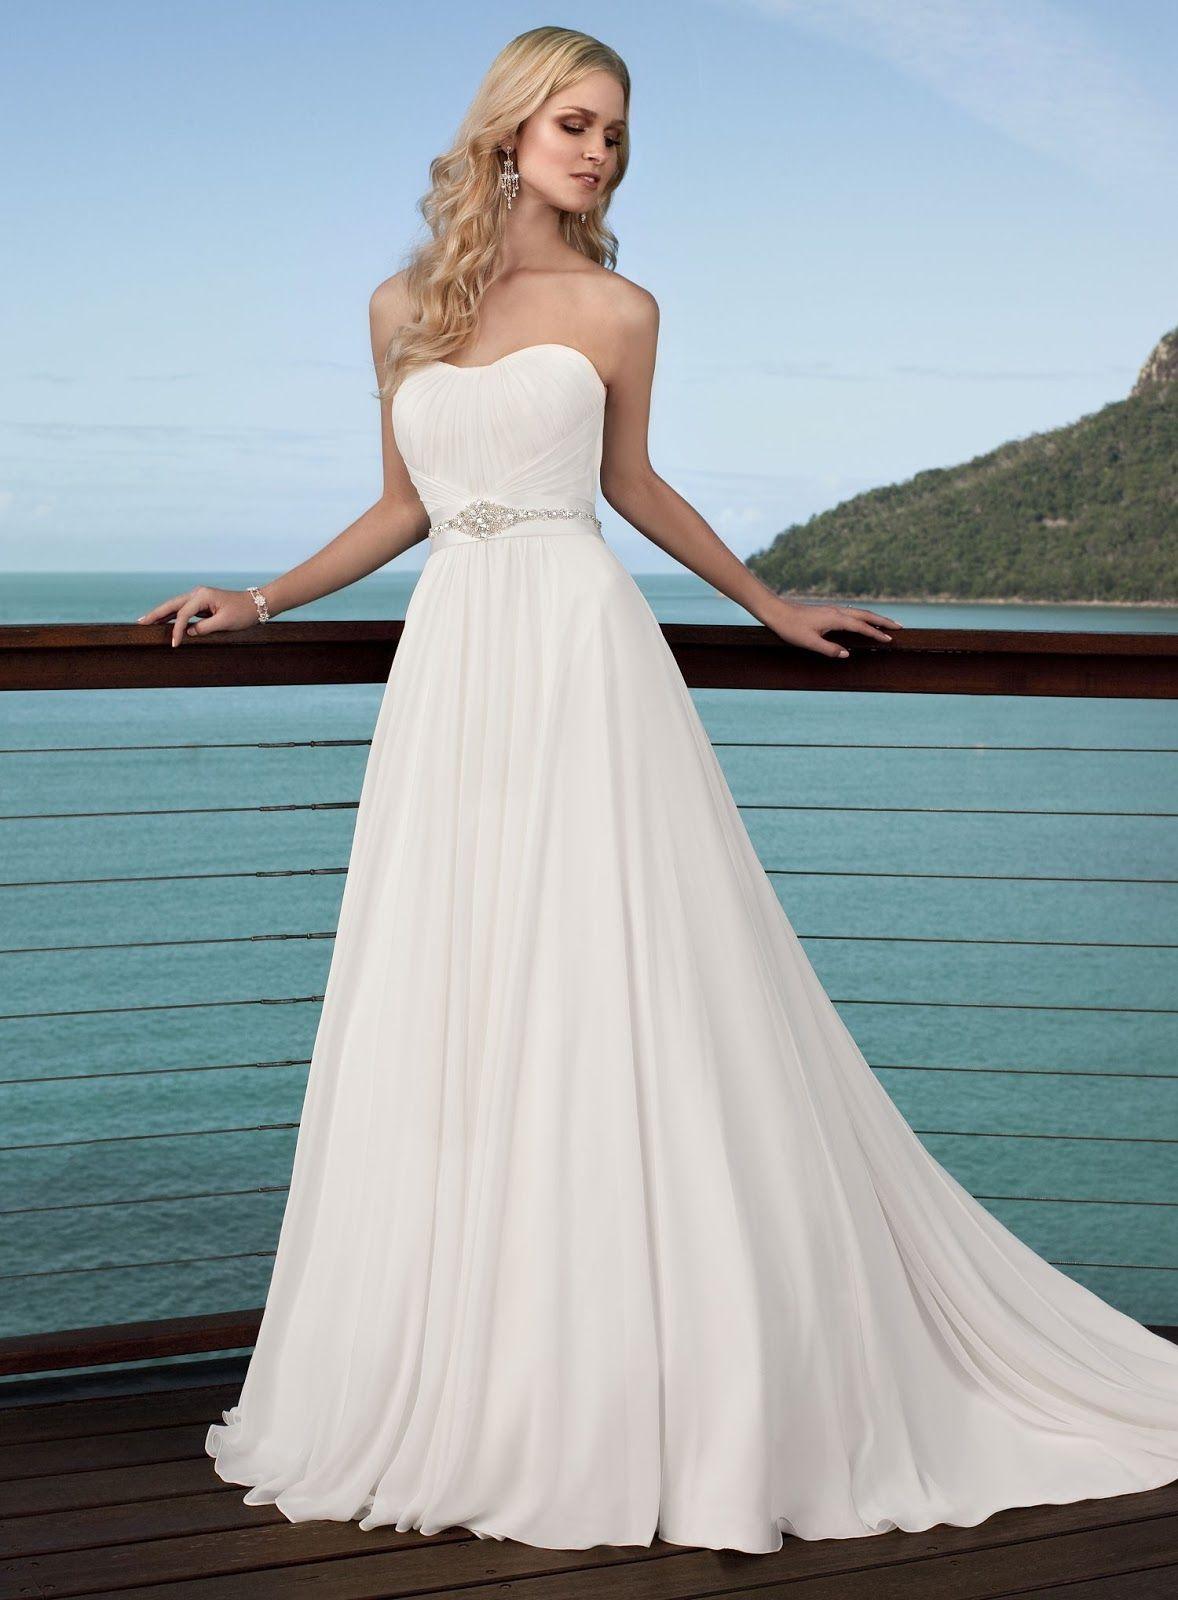 Vestidos de novia para playa | VESTIDOS DE NOVIA PRECIOSOS ...